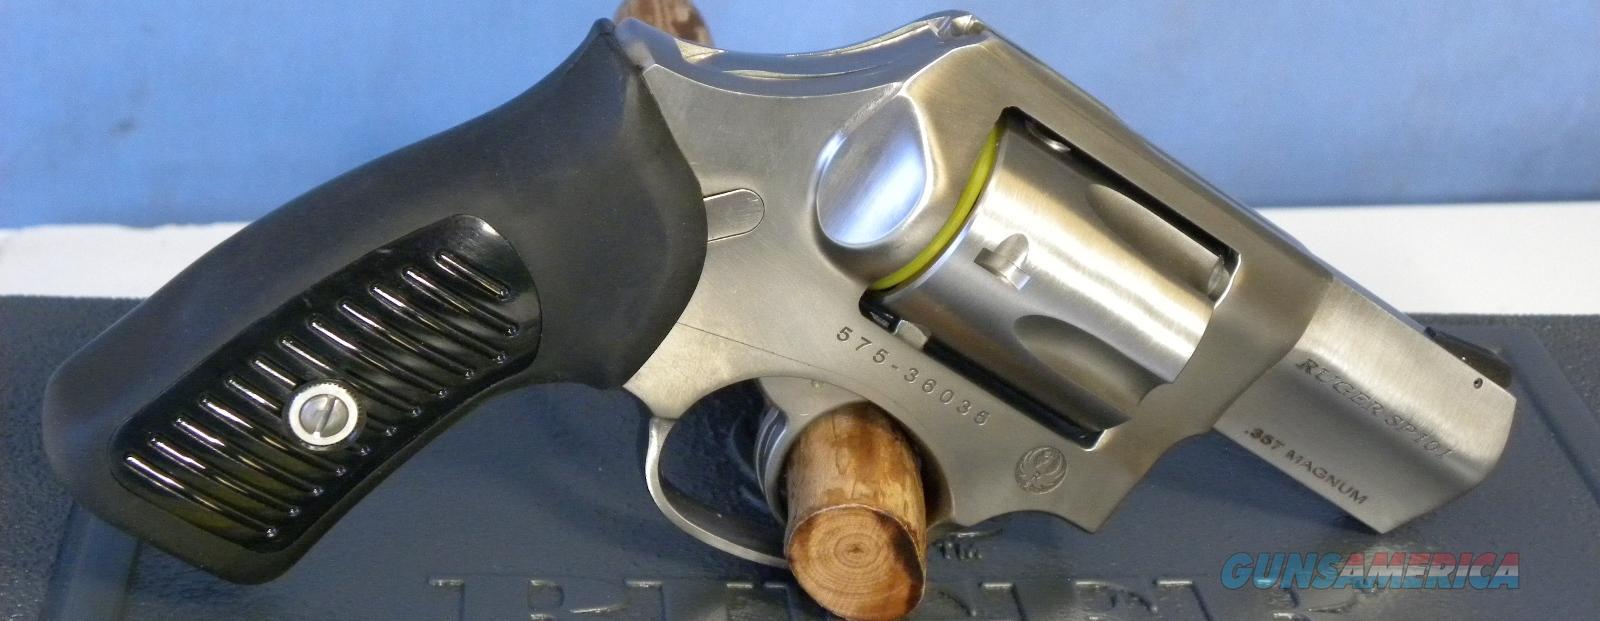 Ruger SP101 .357 Mag SS Bobbed Hammer 5720  Guns > Pistols > Ruger Double Action Revolver > SP101 Type